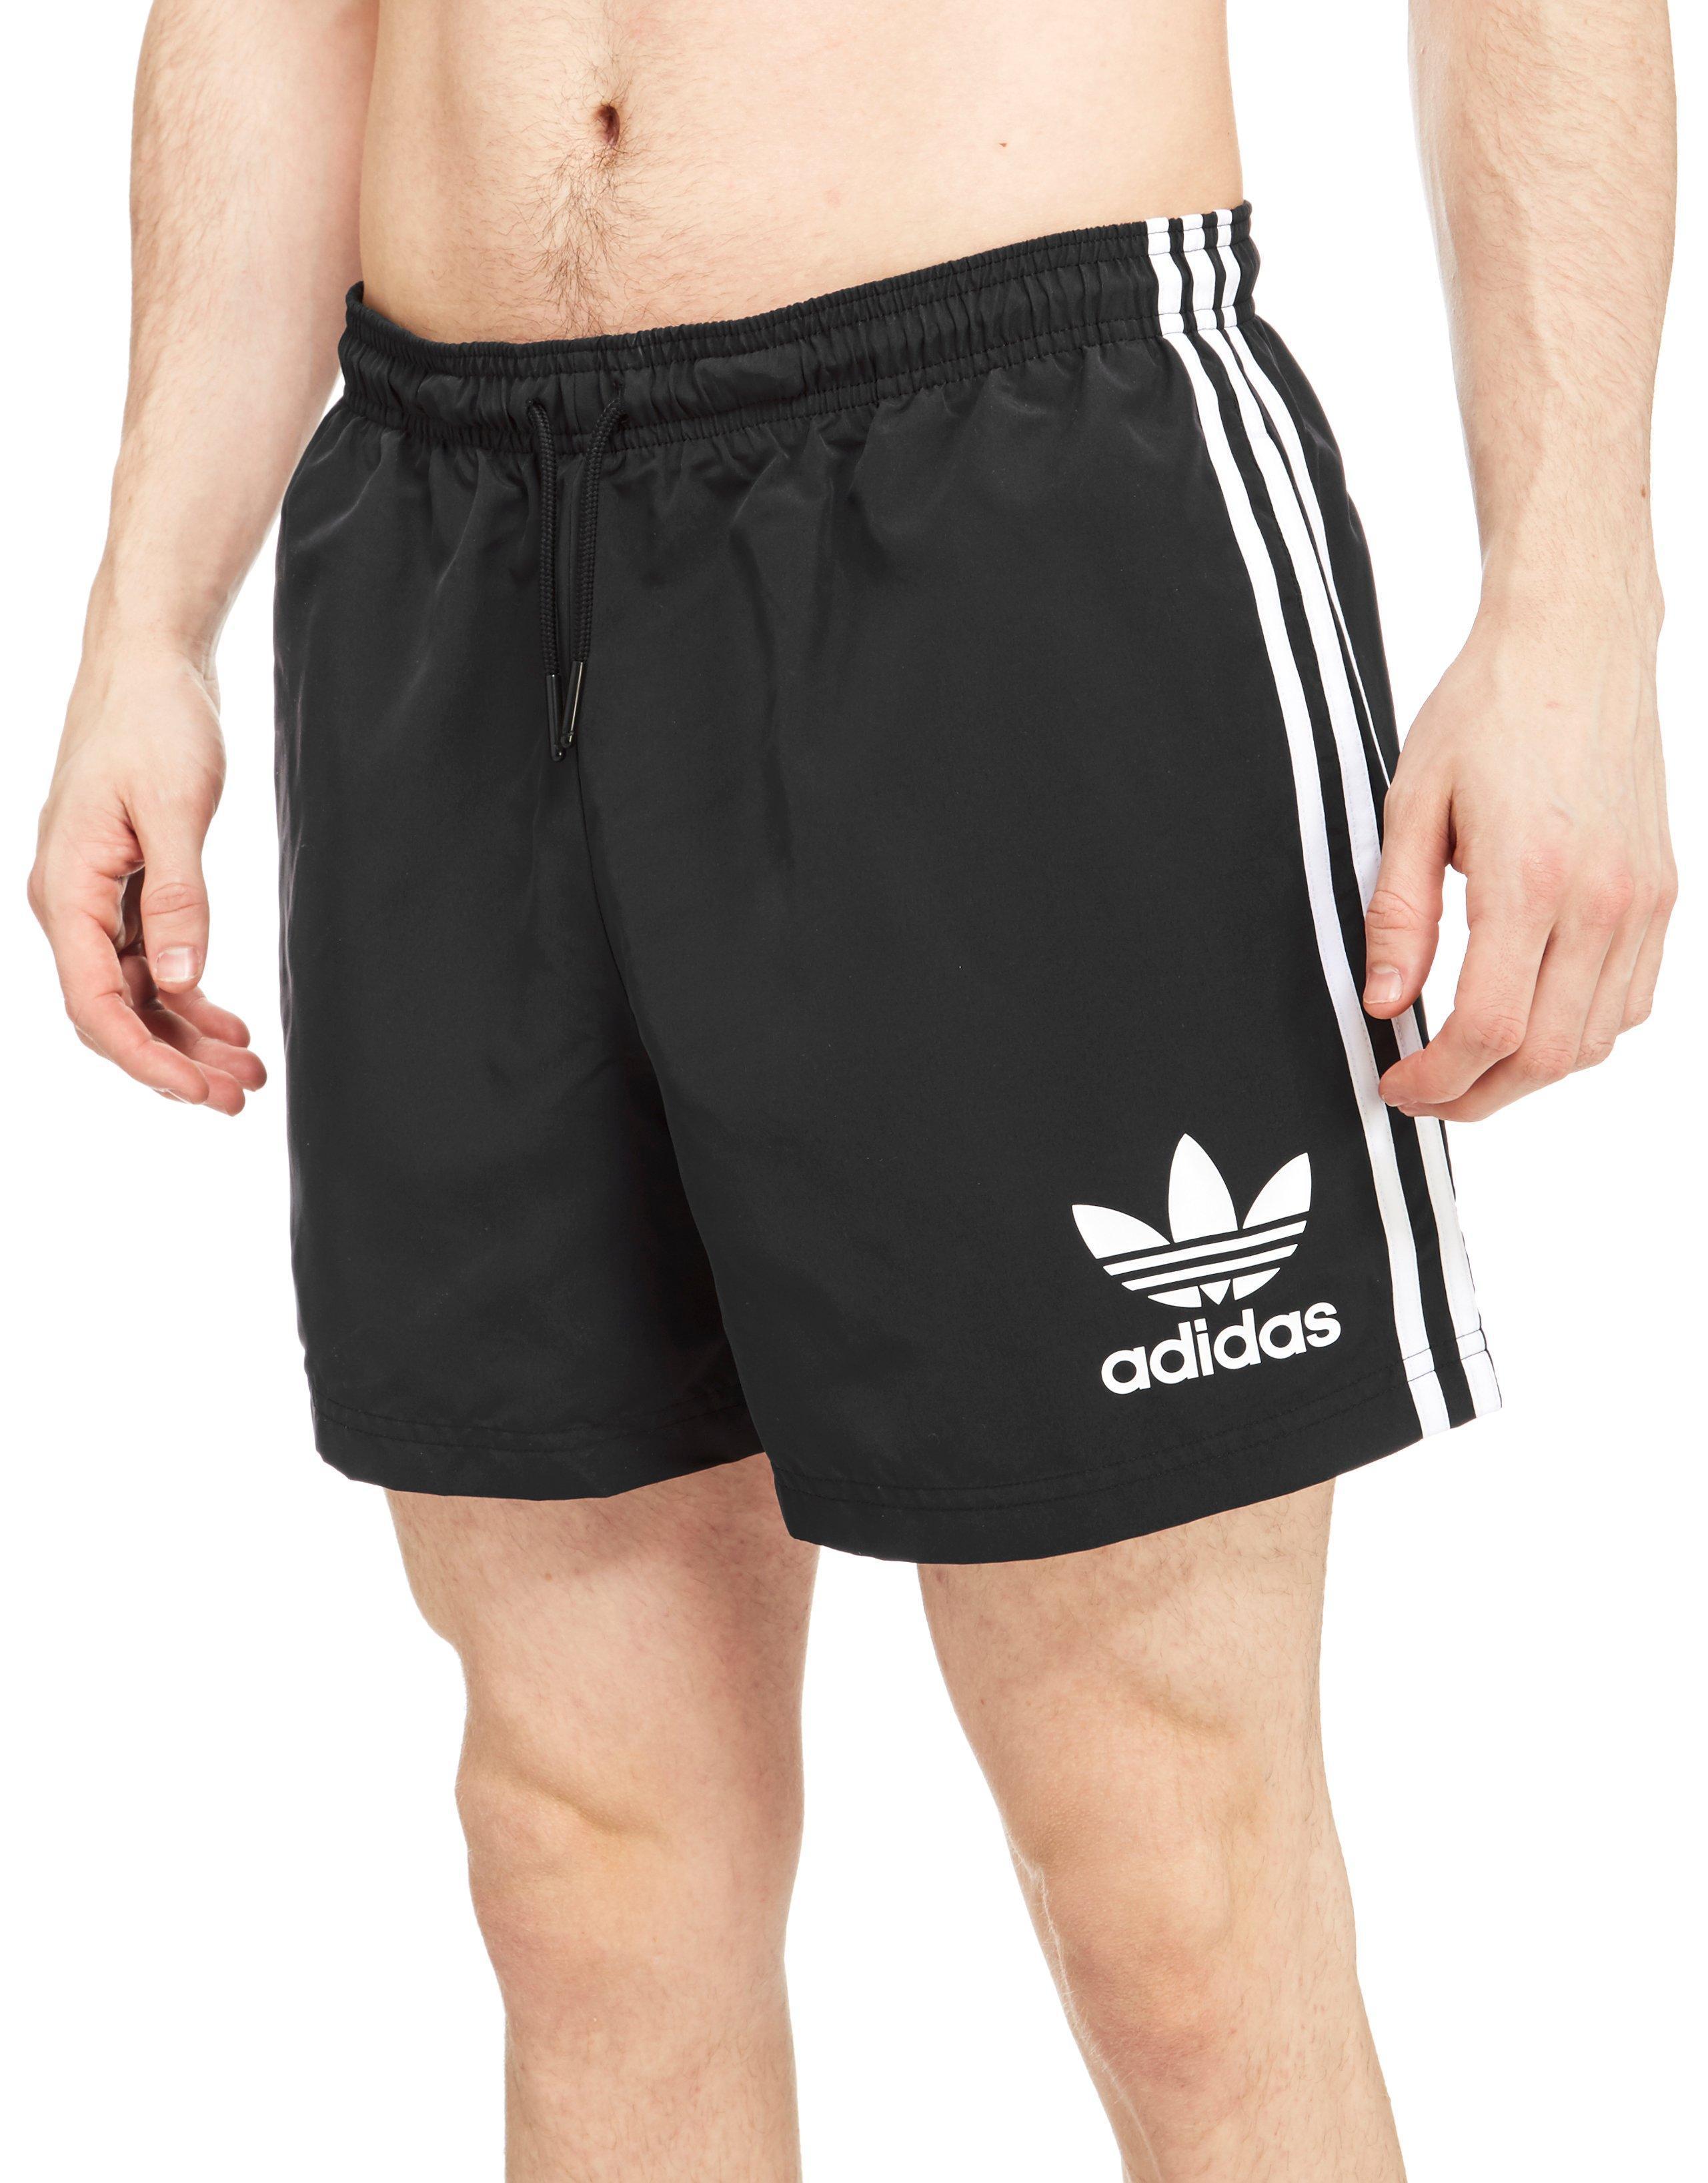 673e712f74 adidas Originals Cali Swimshorts in Black for Men - Lyst